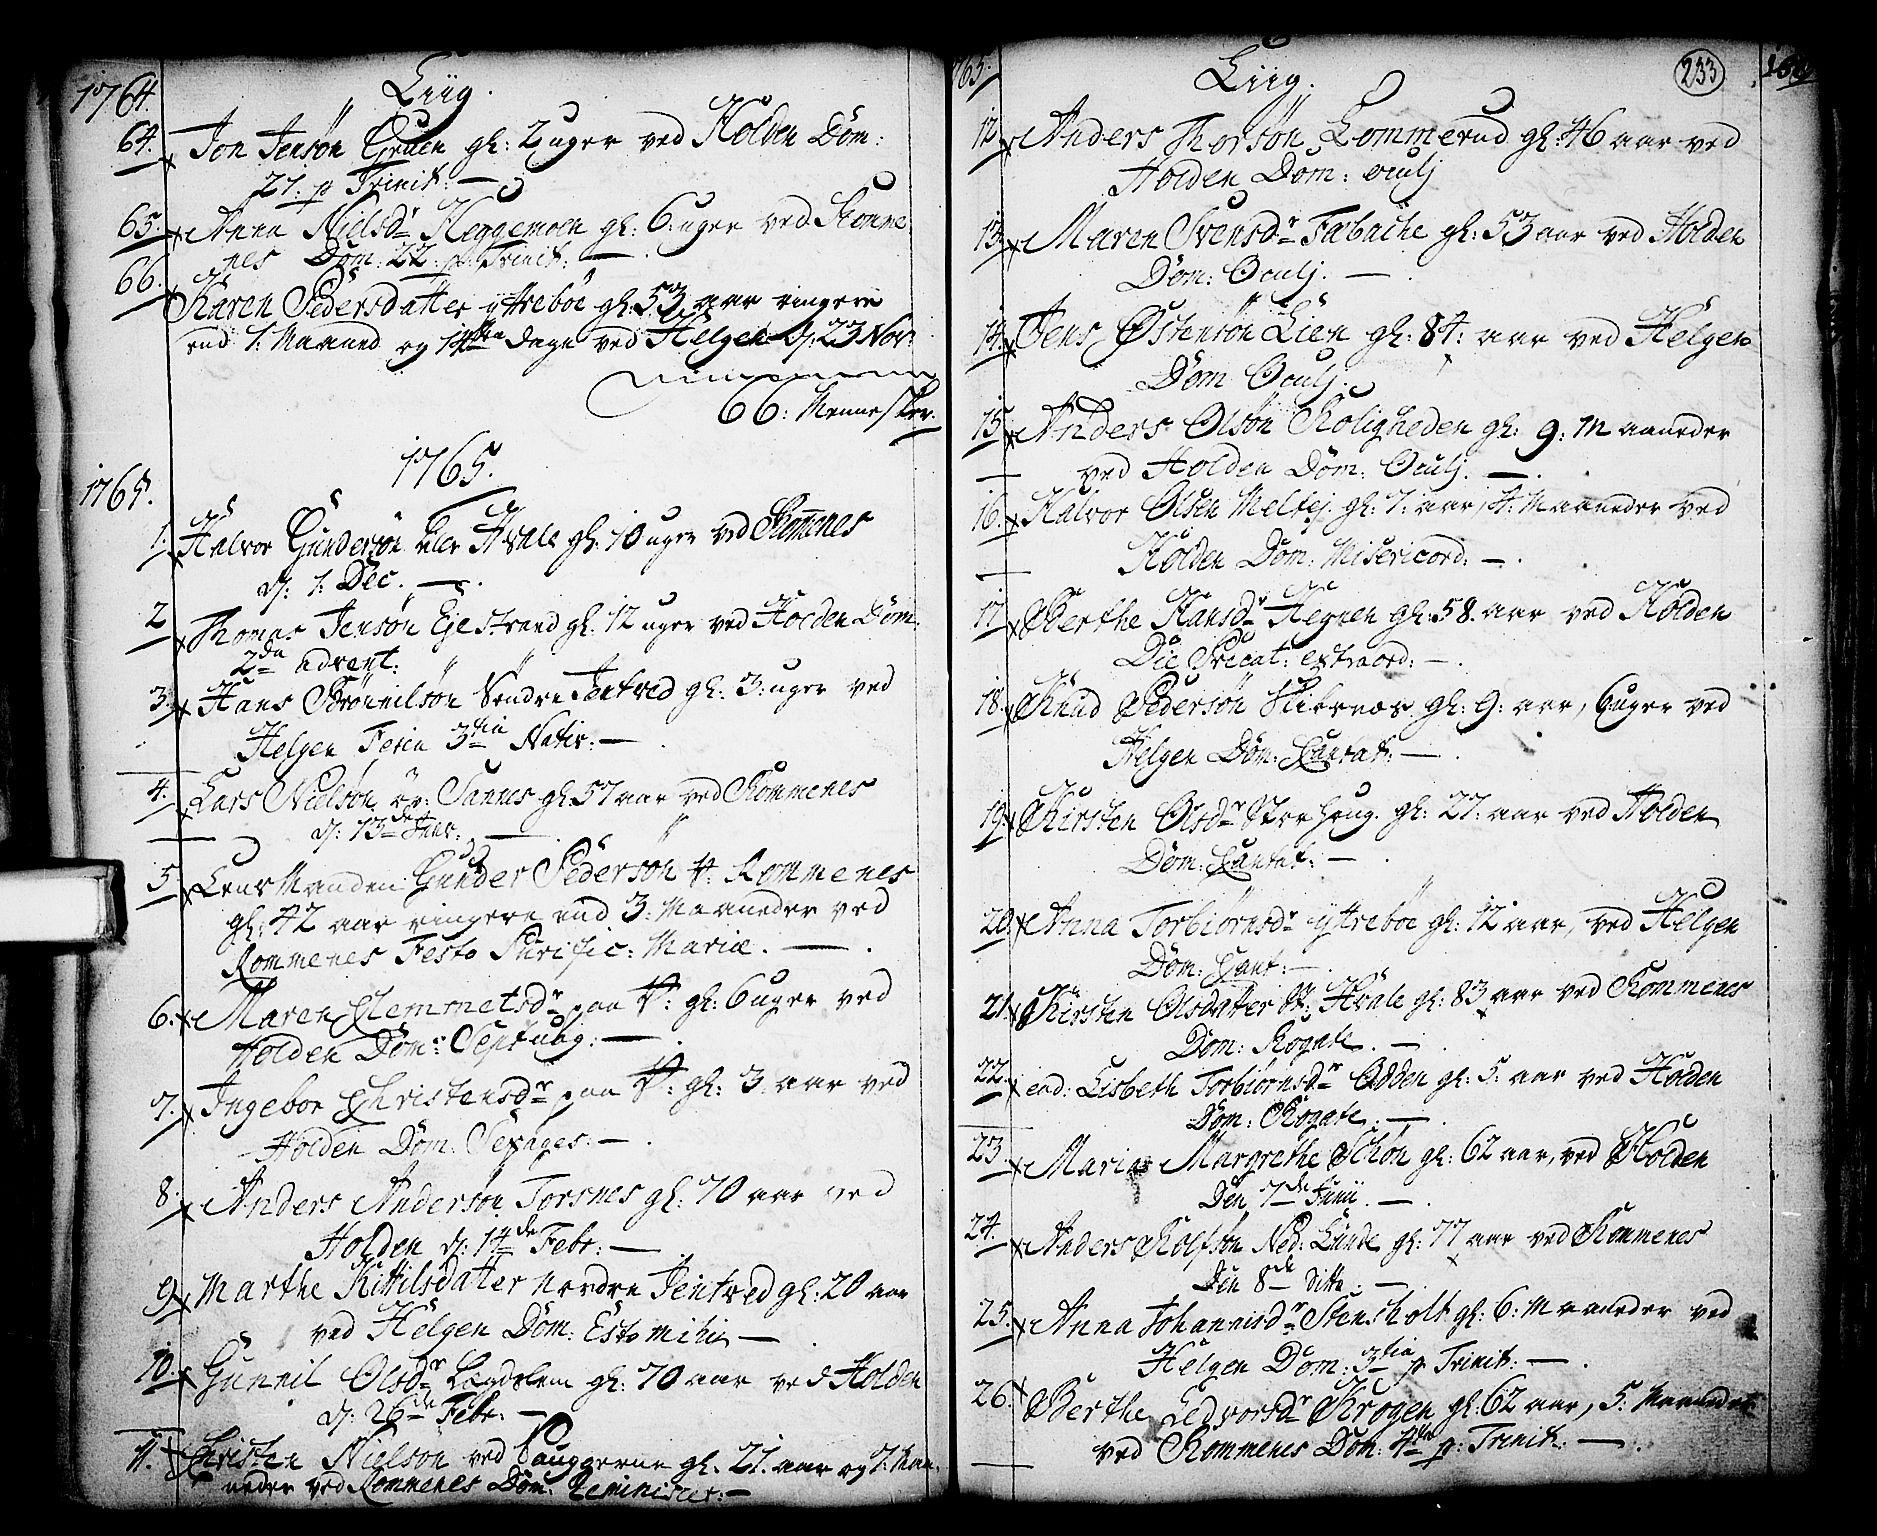 SAKO, Holla kirkebøker, F/Fa/L0001: Ministerialbok nr. 1, 1717-1779, s. 233